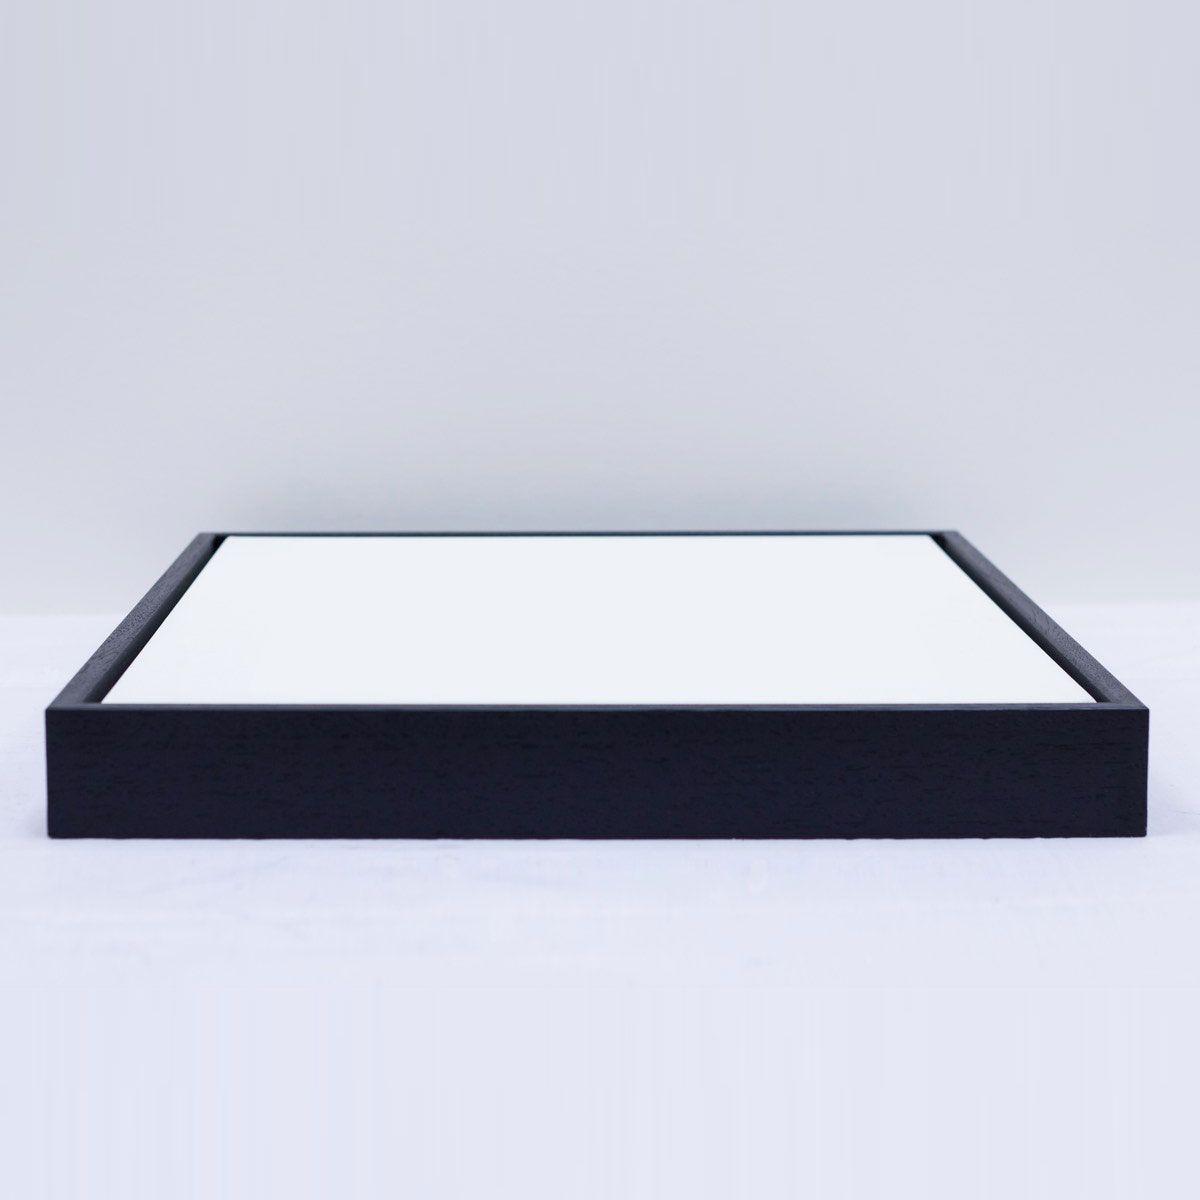 Framed Canvas Wraps